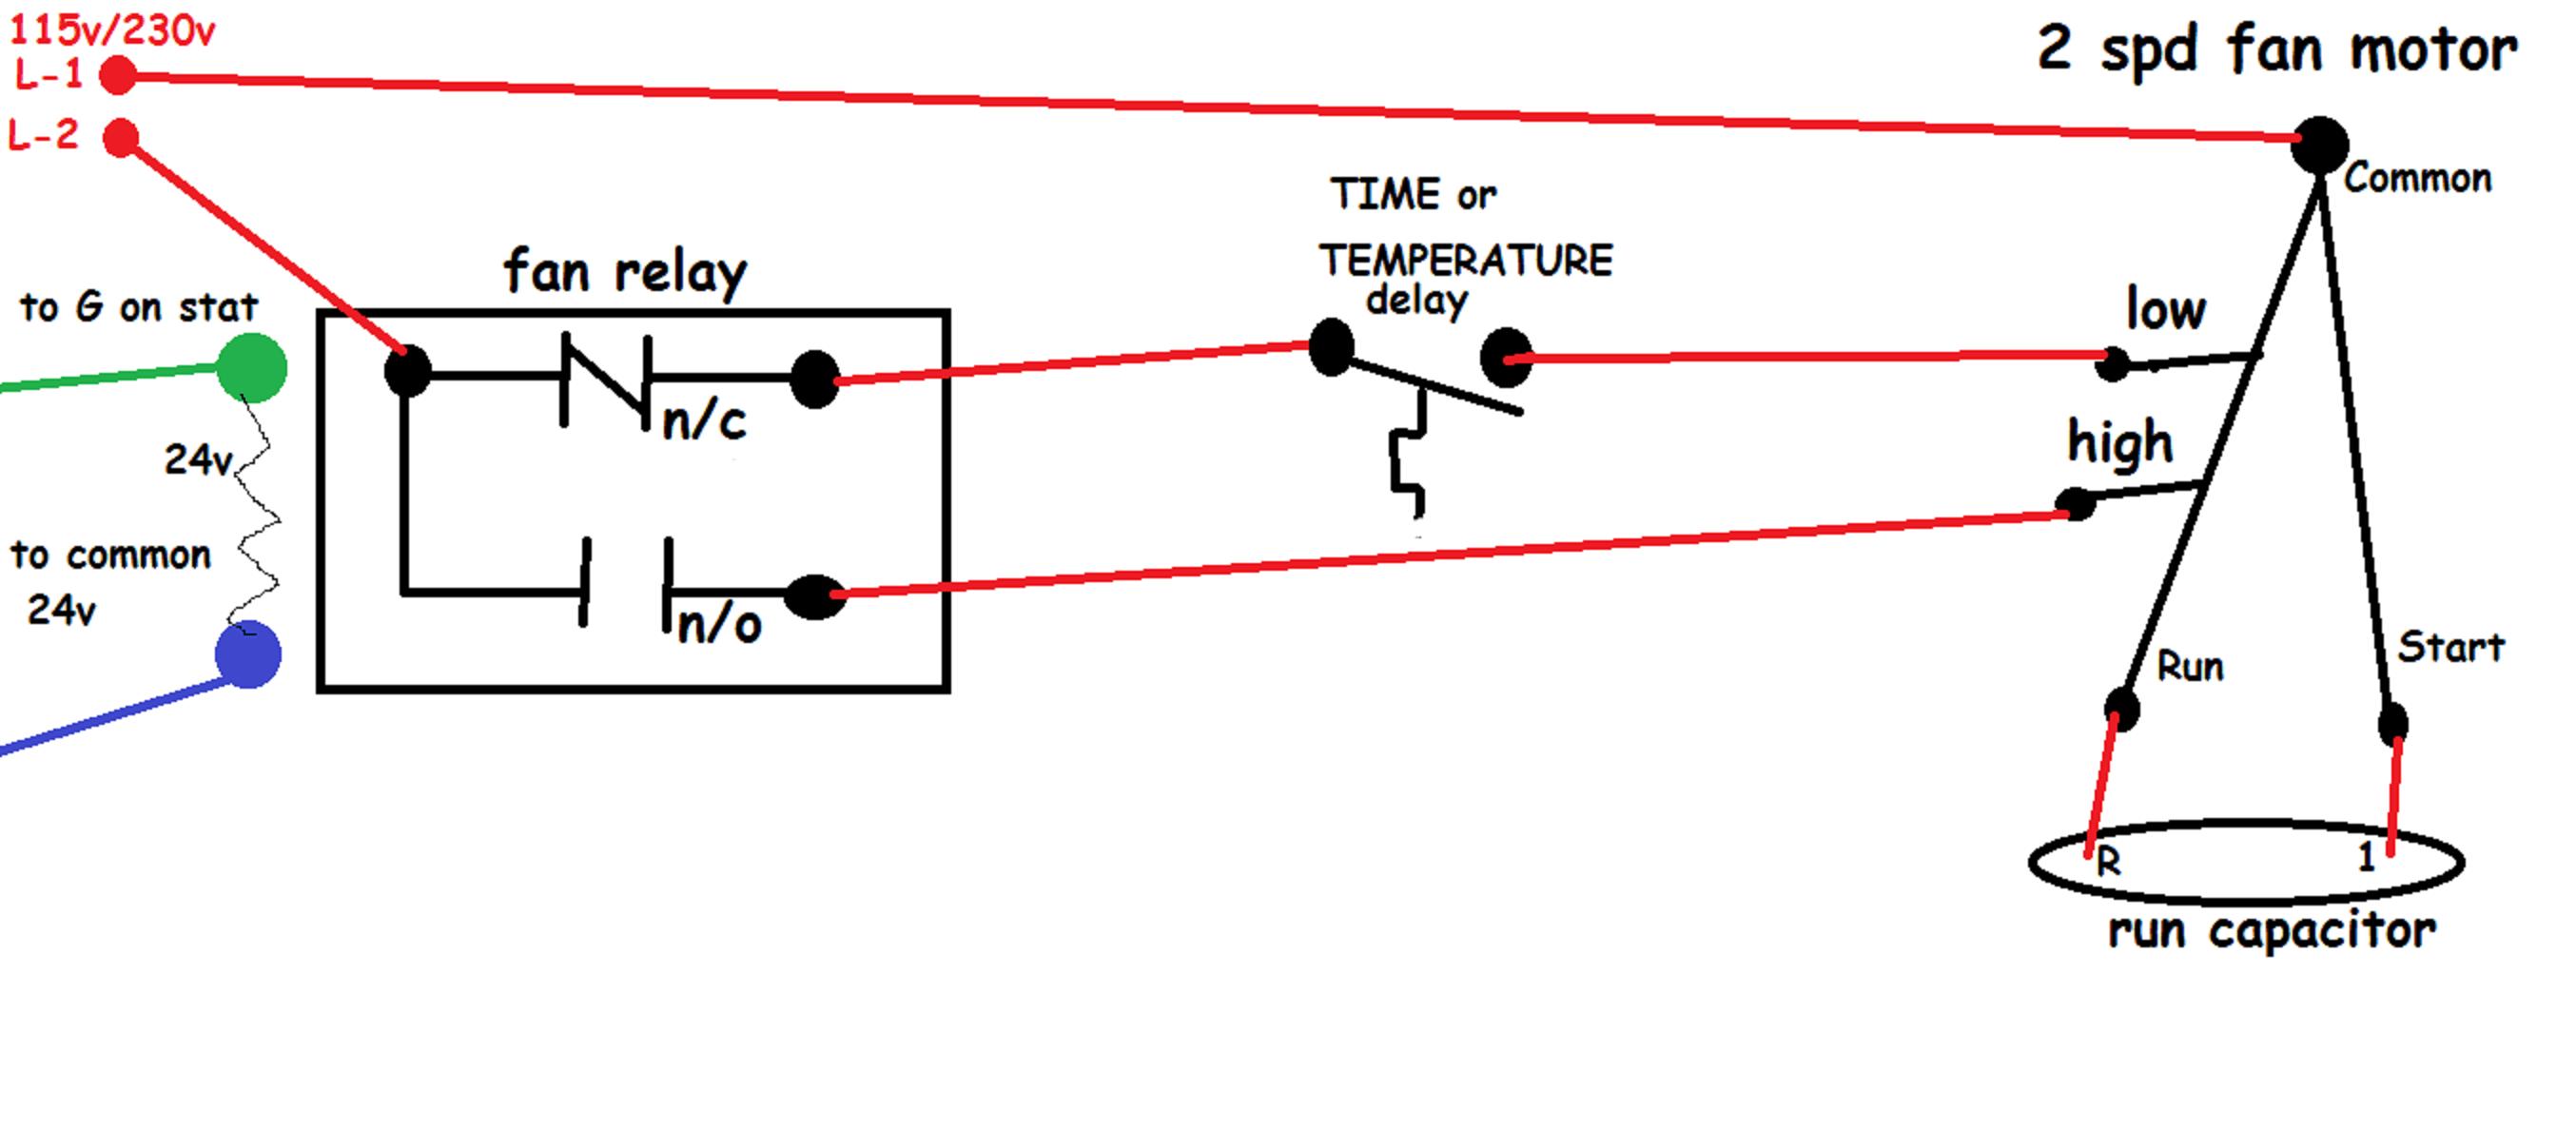 5qo8m?resize=665%2C292&ssl=1 westlock limit switch wiring diagram wiring diagram Square D Pumptrol Wiring at gsmportal.co